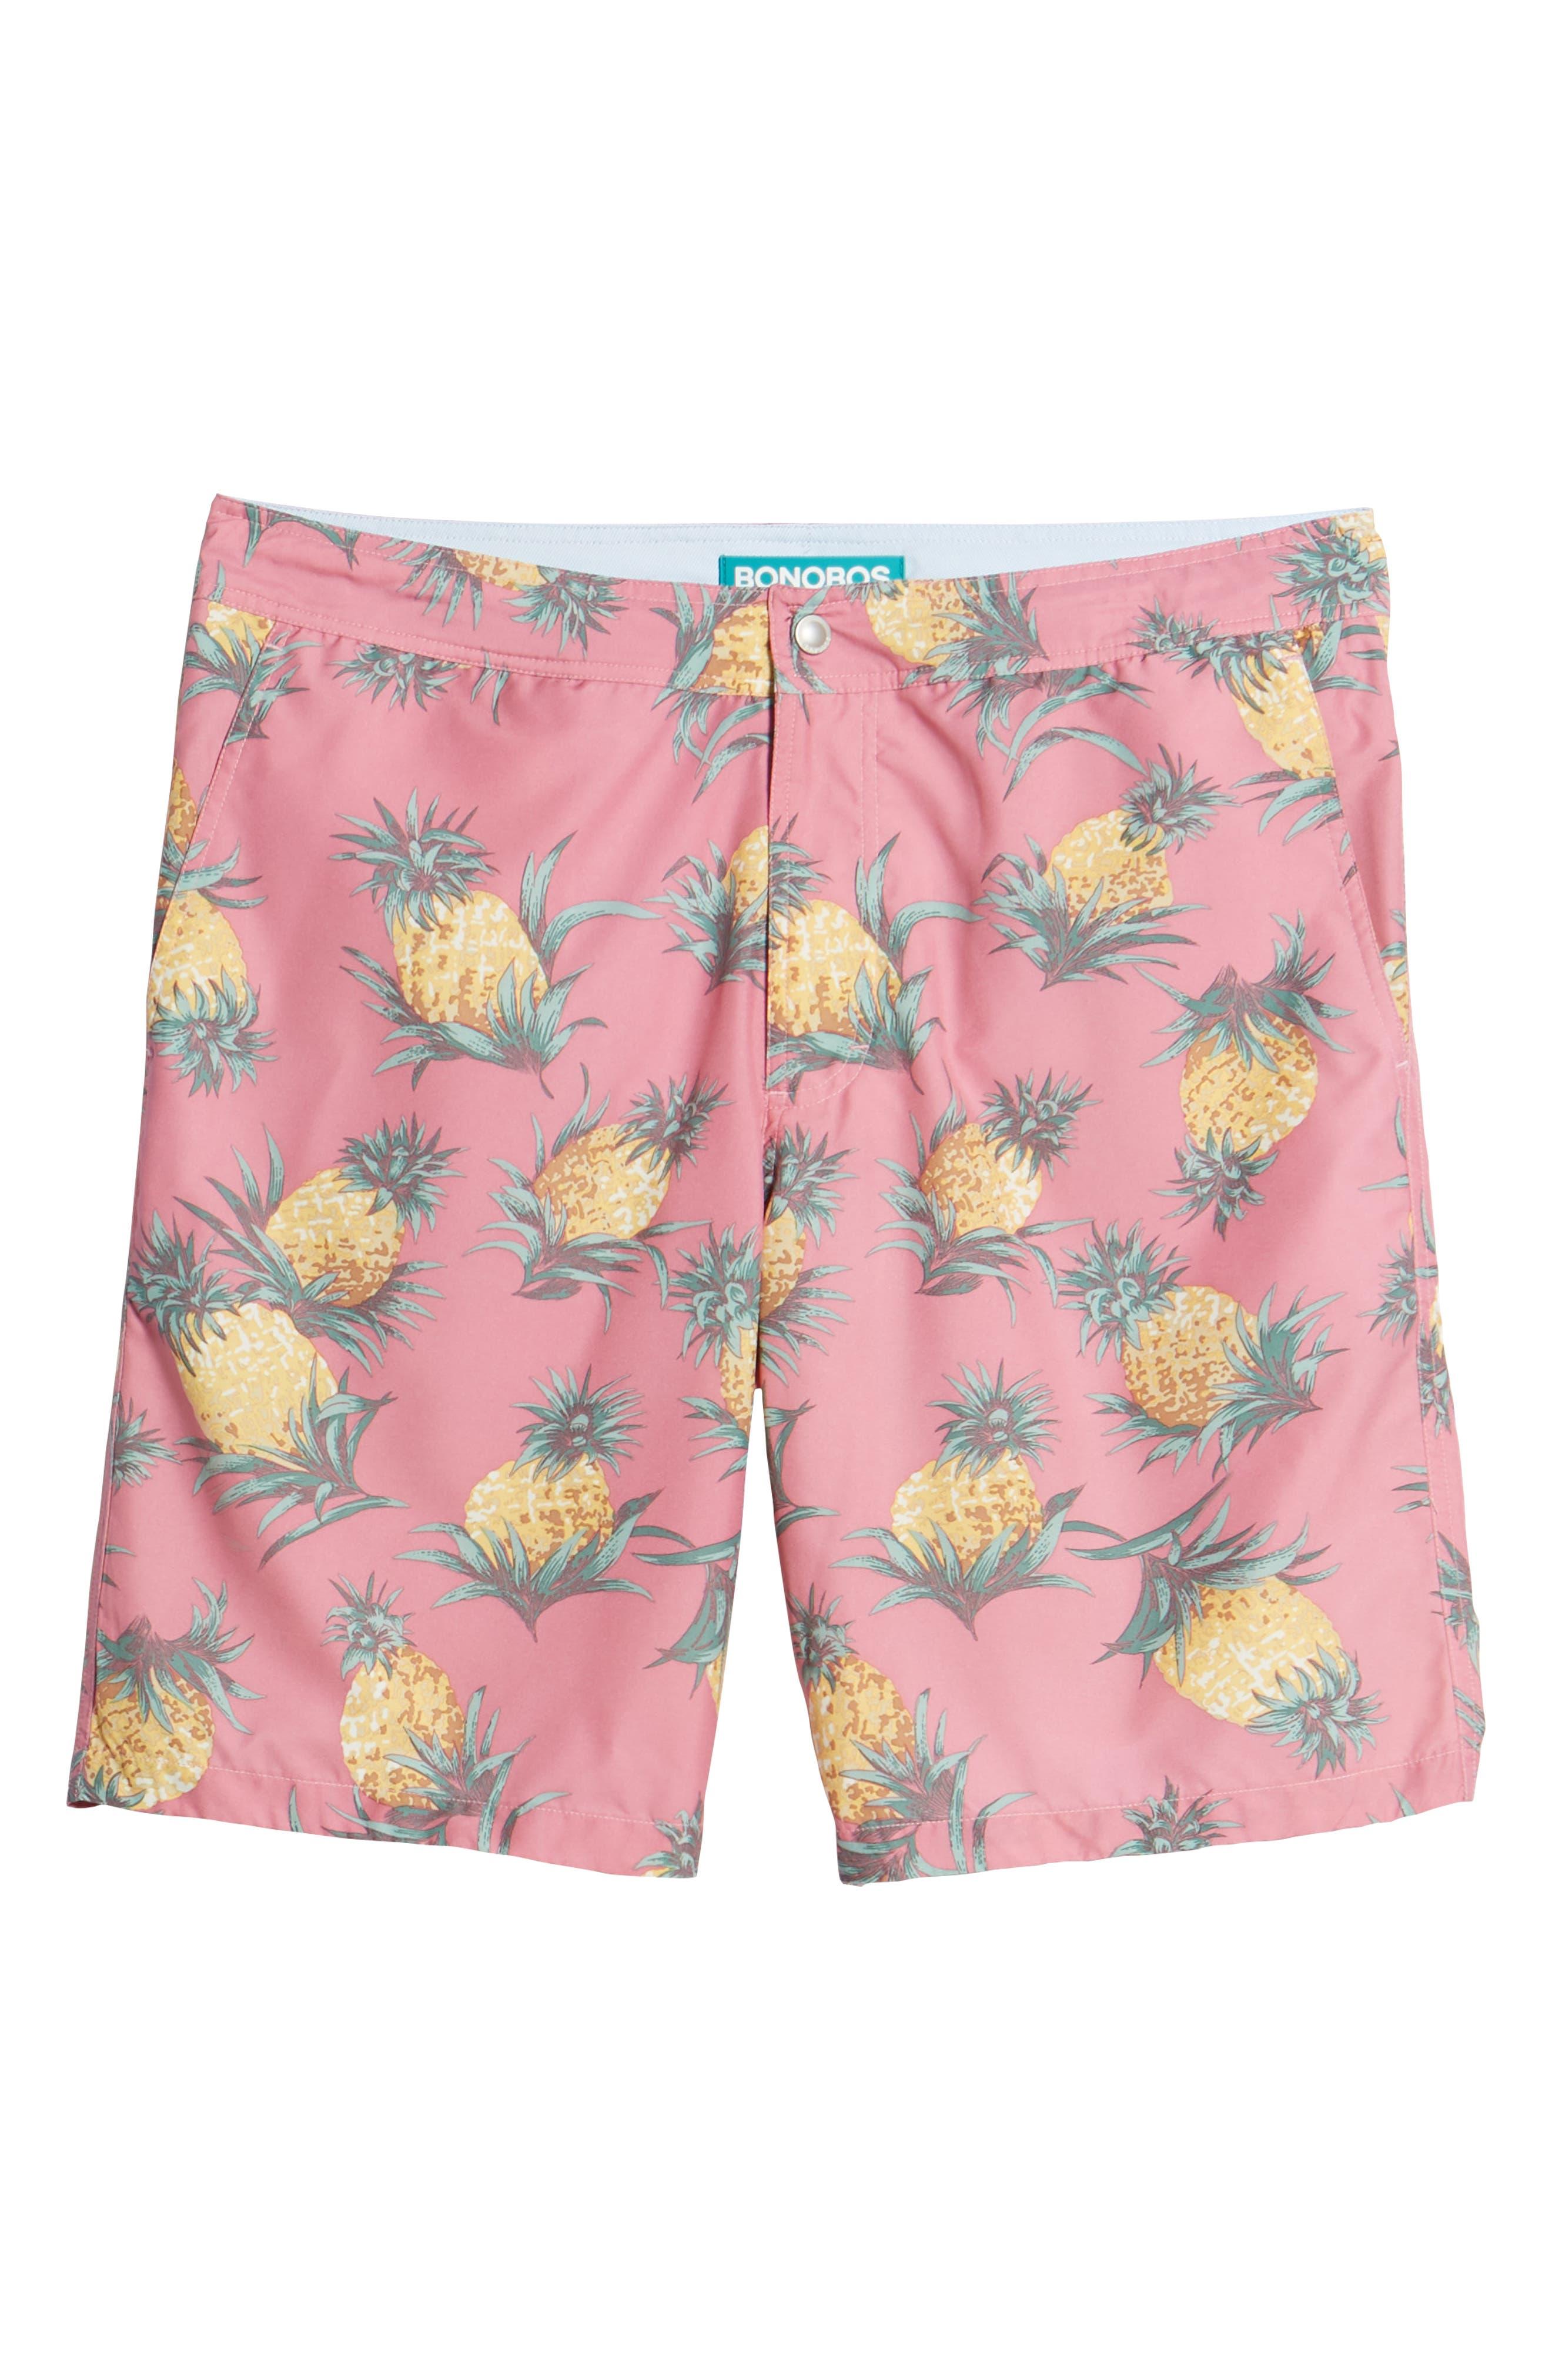 Banzai 9-Inch Swim Trunks,                             Alternate thumbnail 6, color,                             Pineapples Print